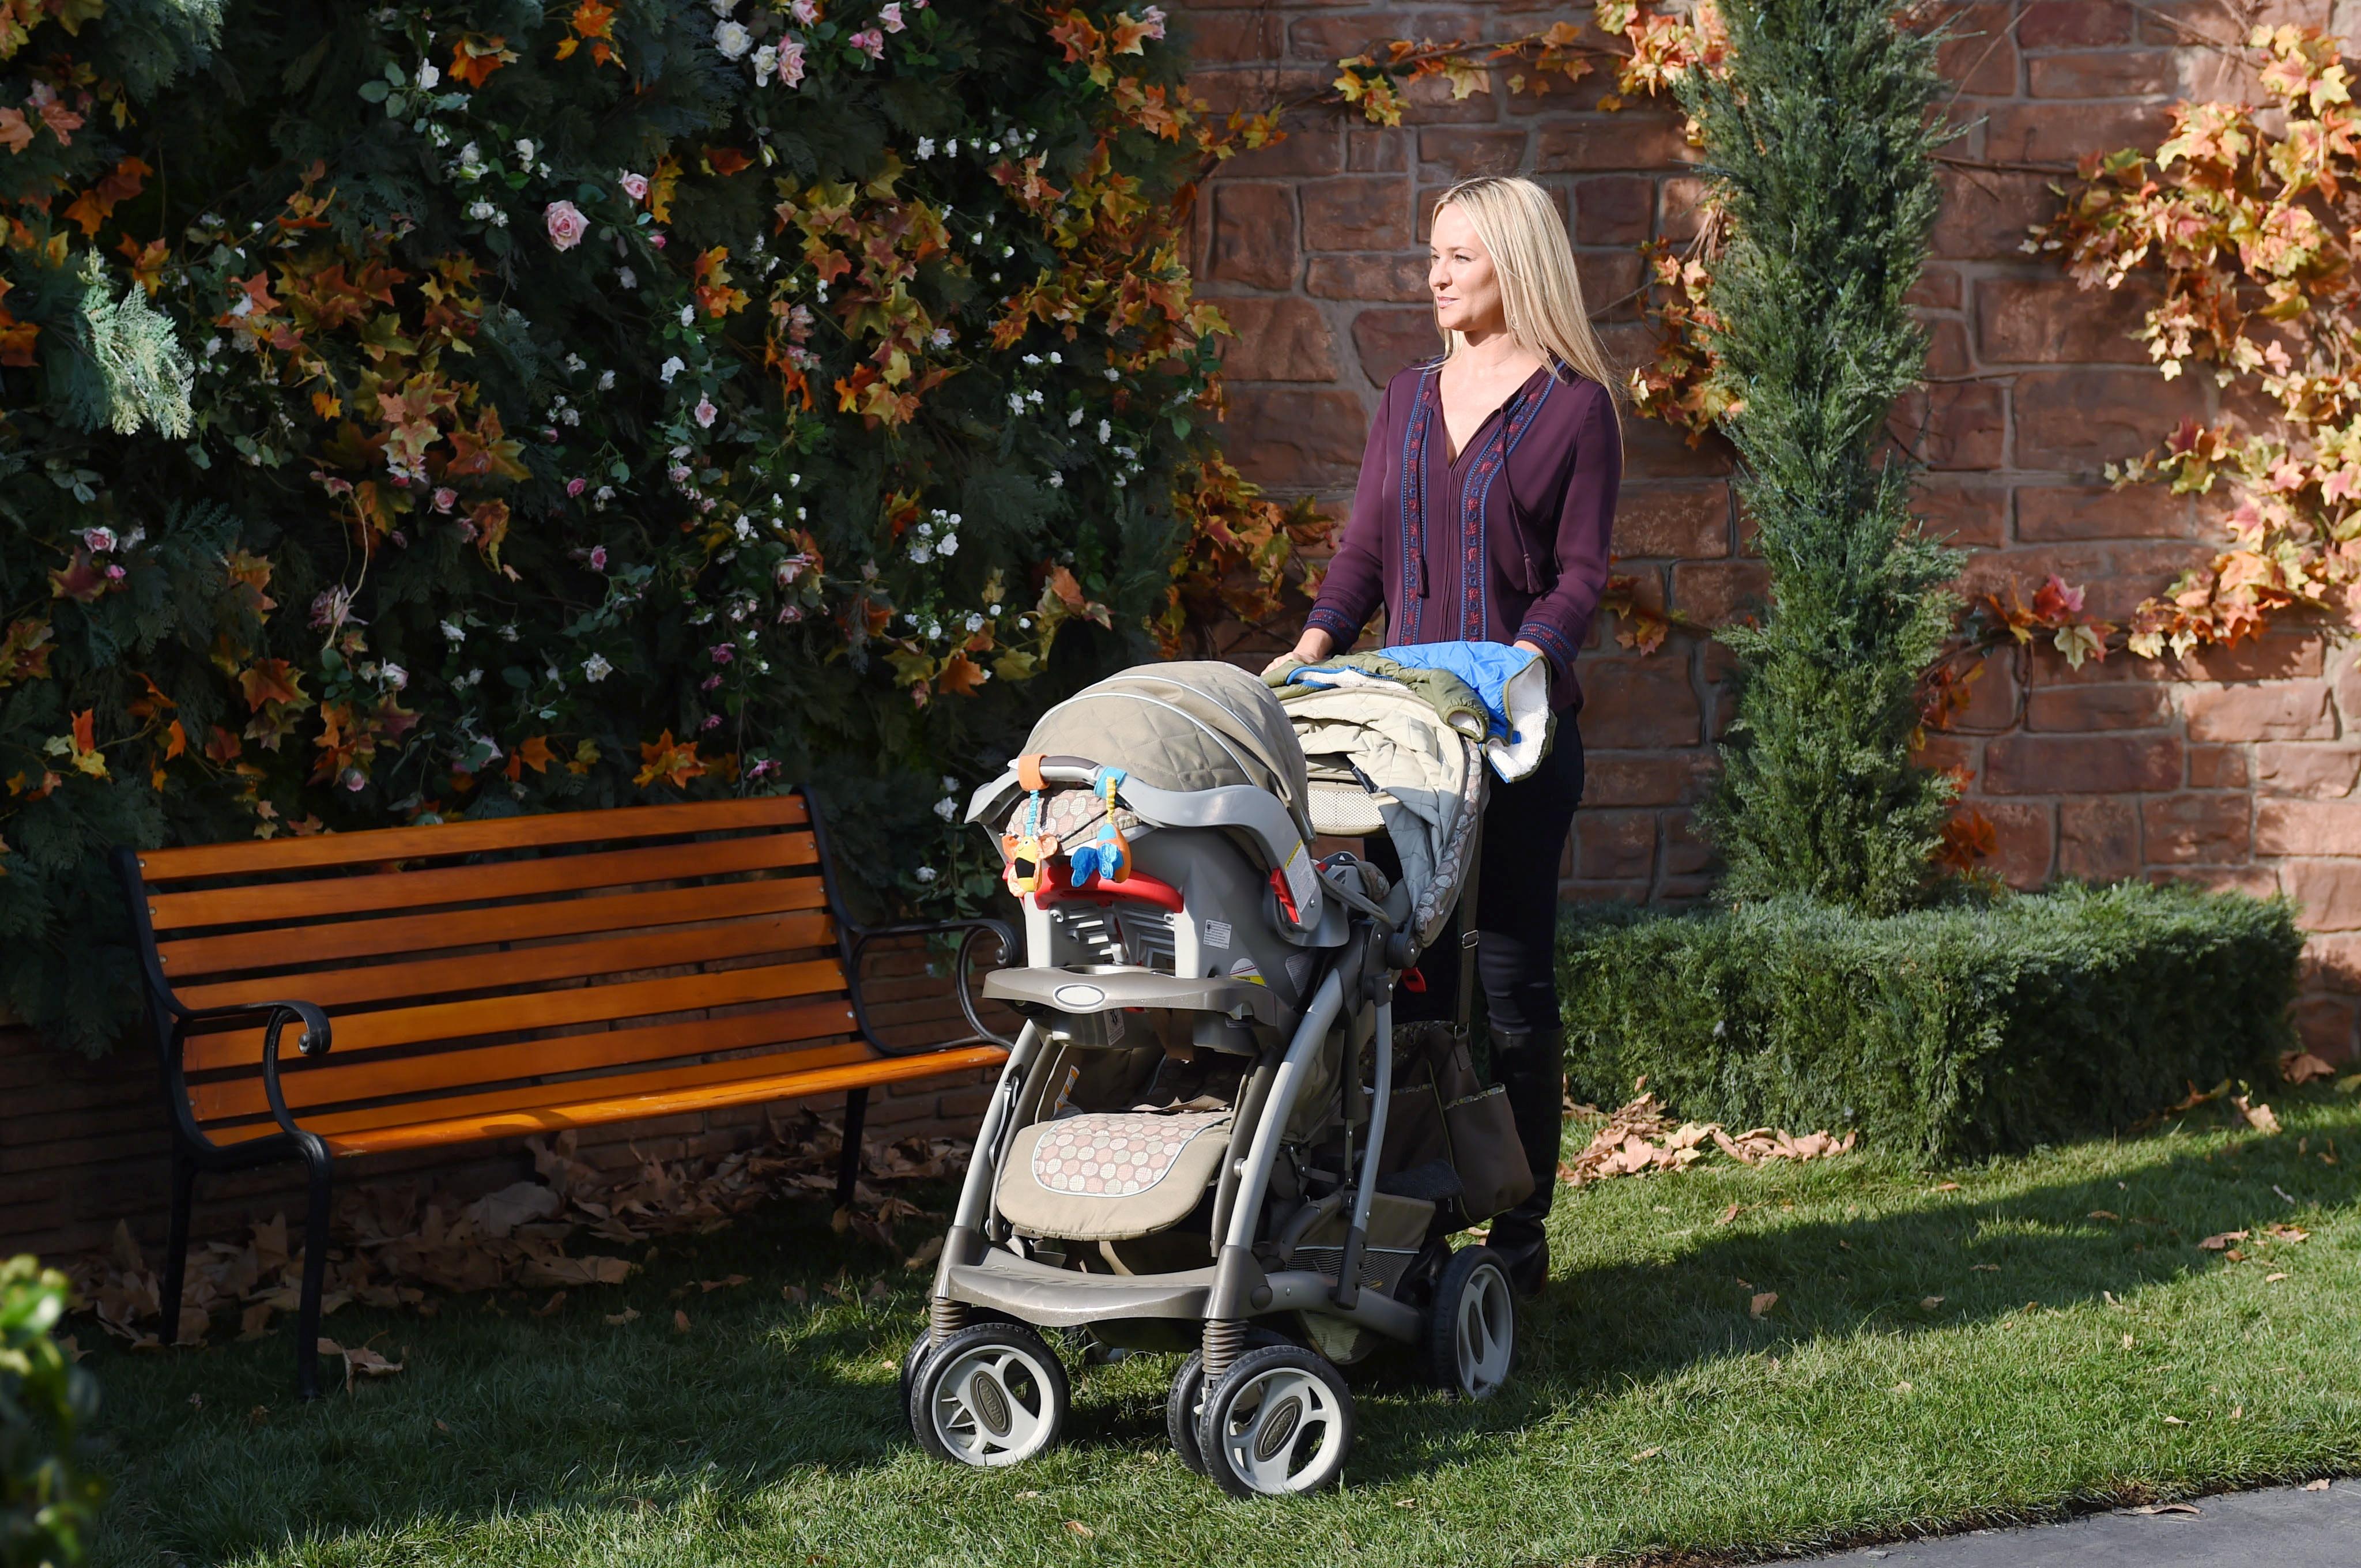 The road to motherhood